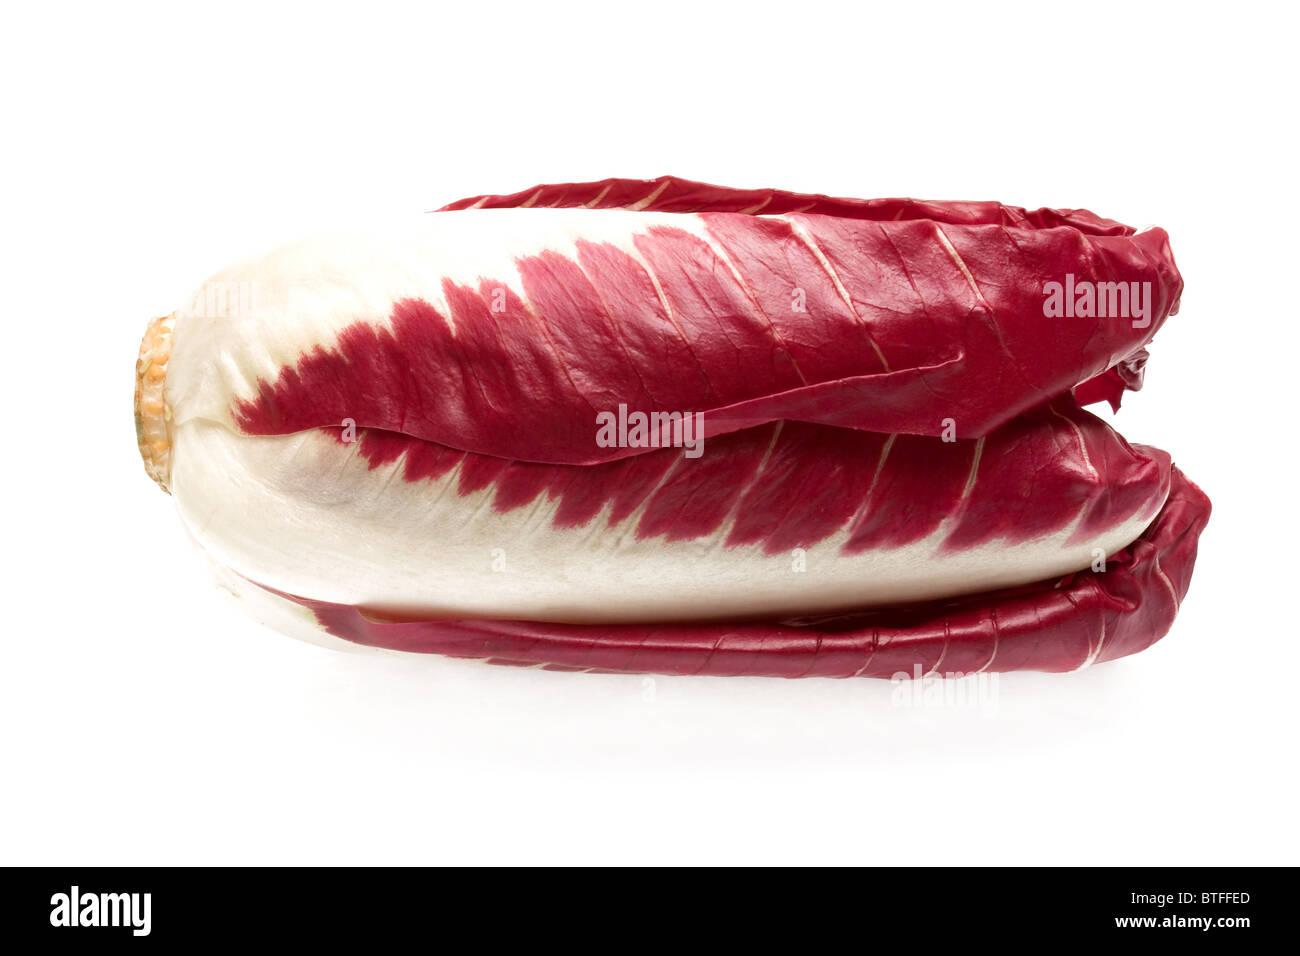 Food Ingredients - Stock Image